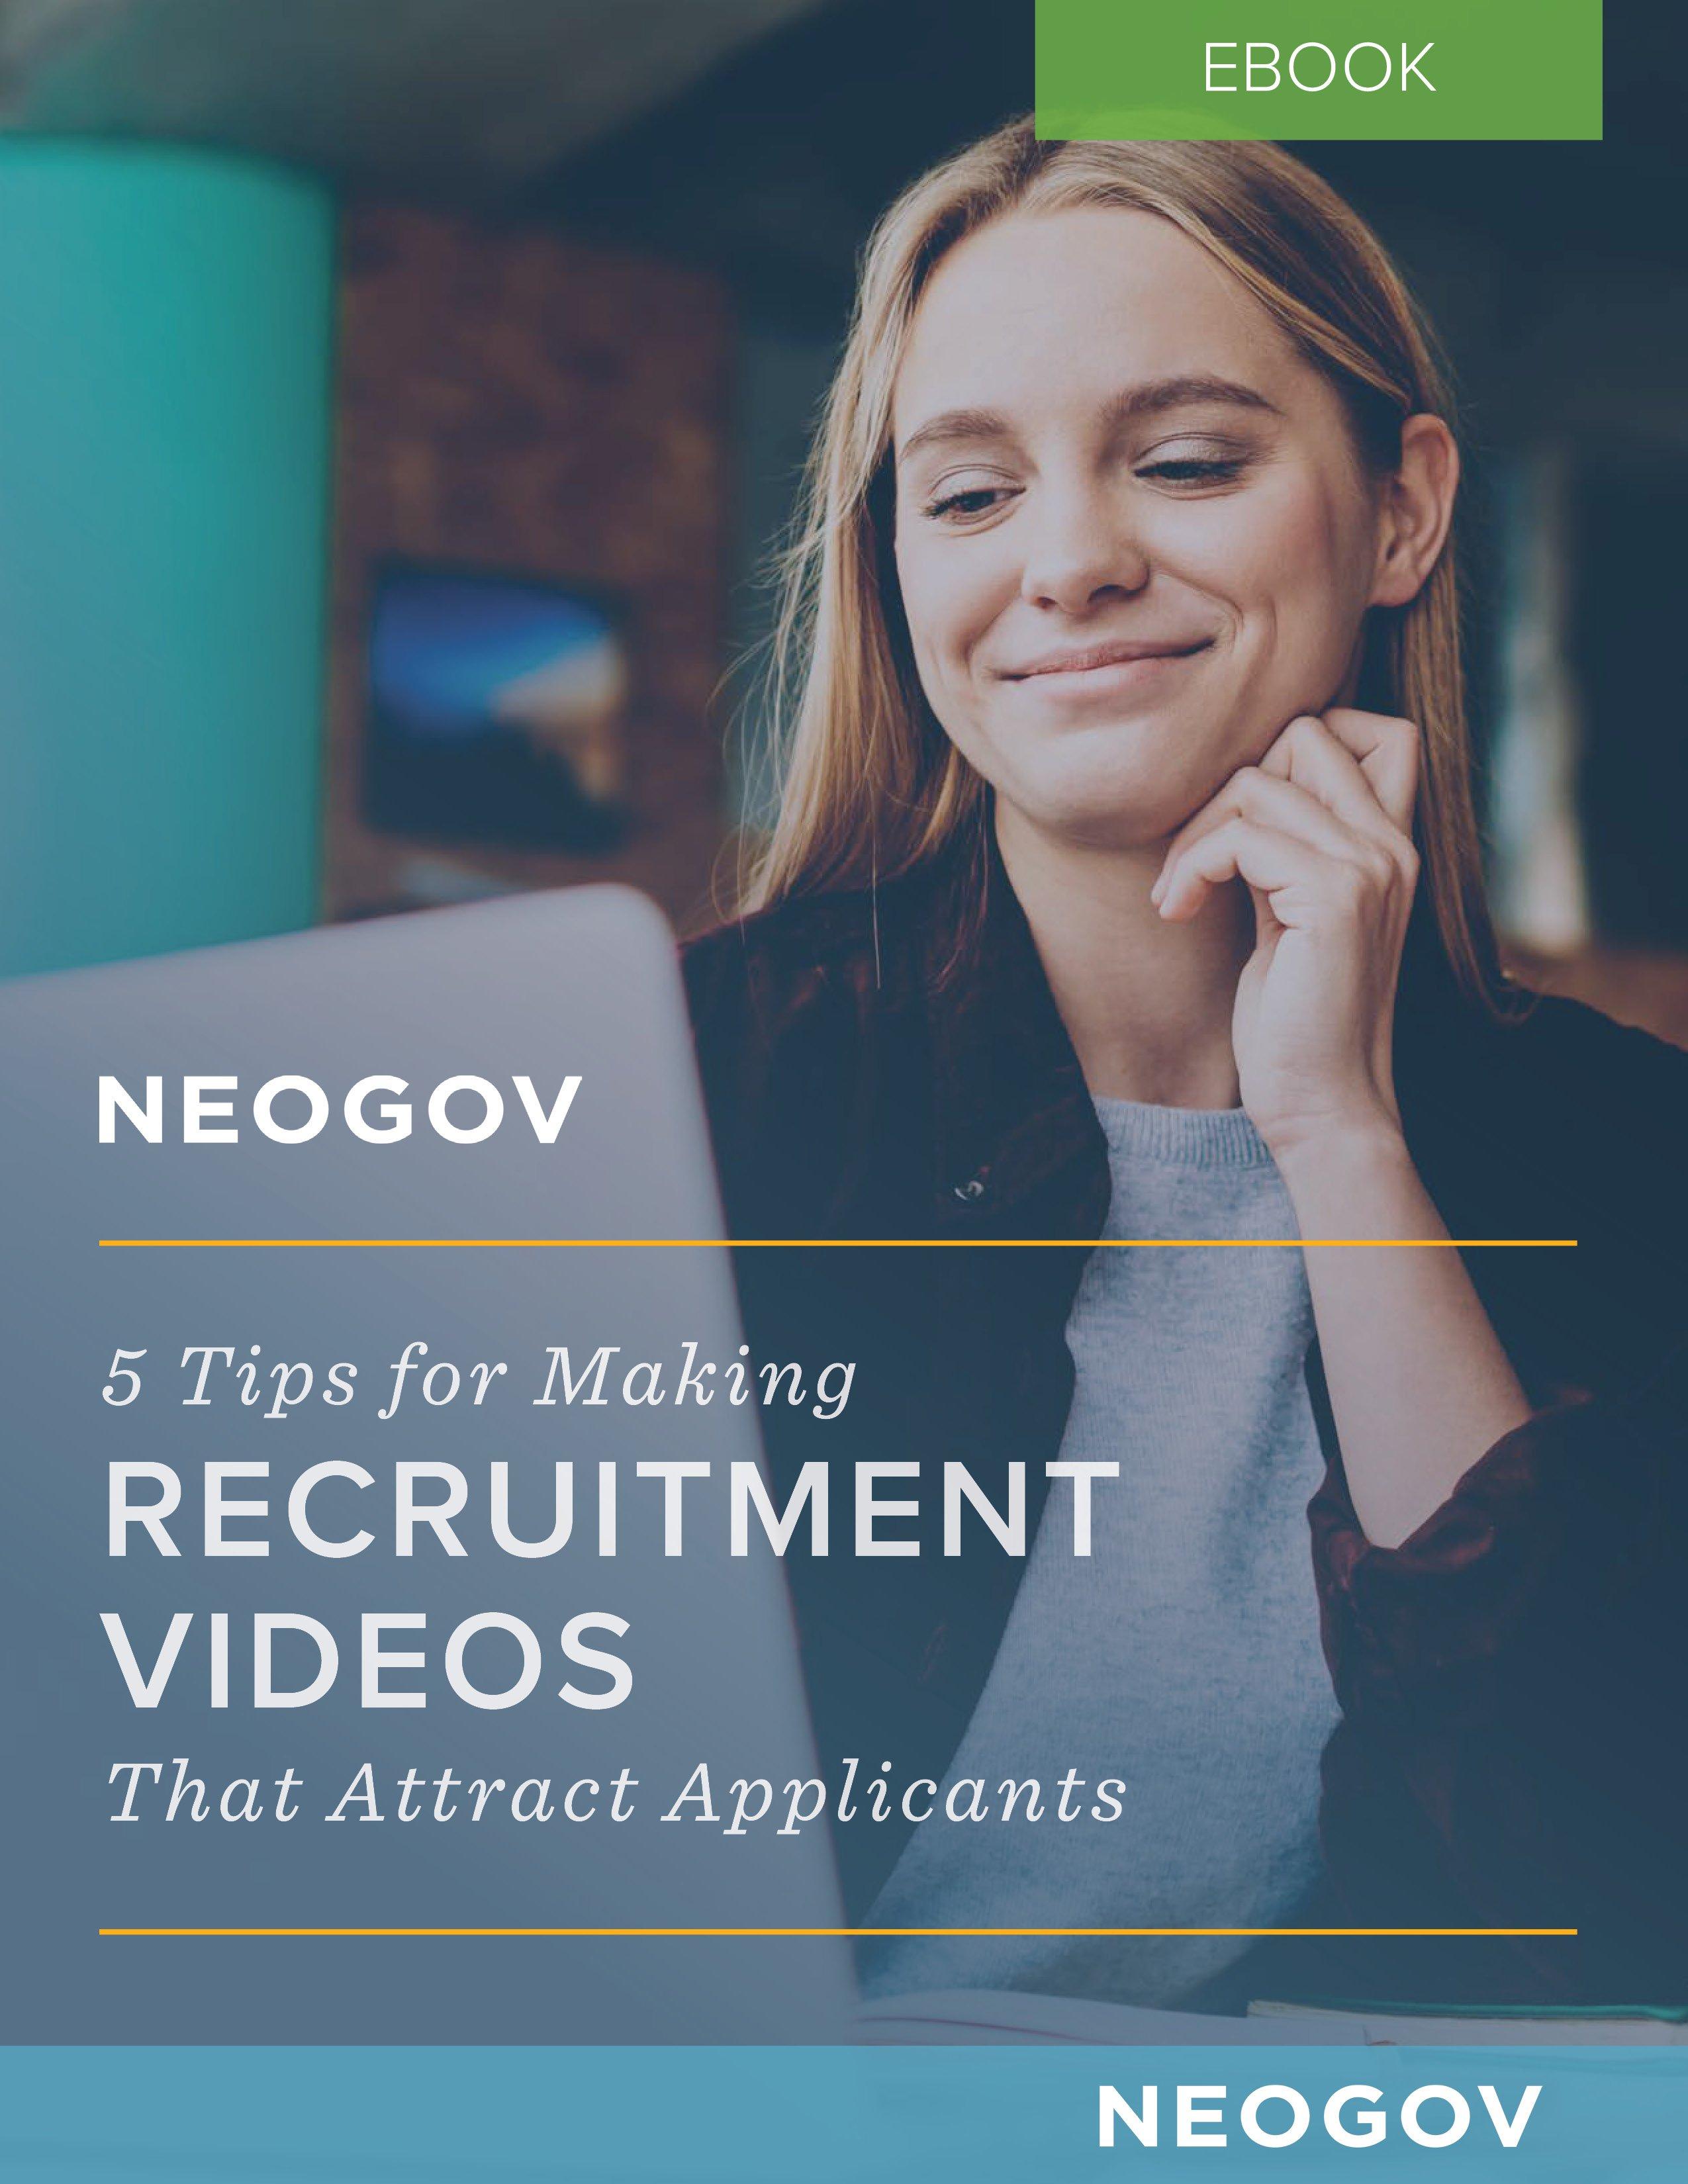 5 Tips for Making Recruitment Videos